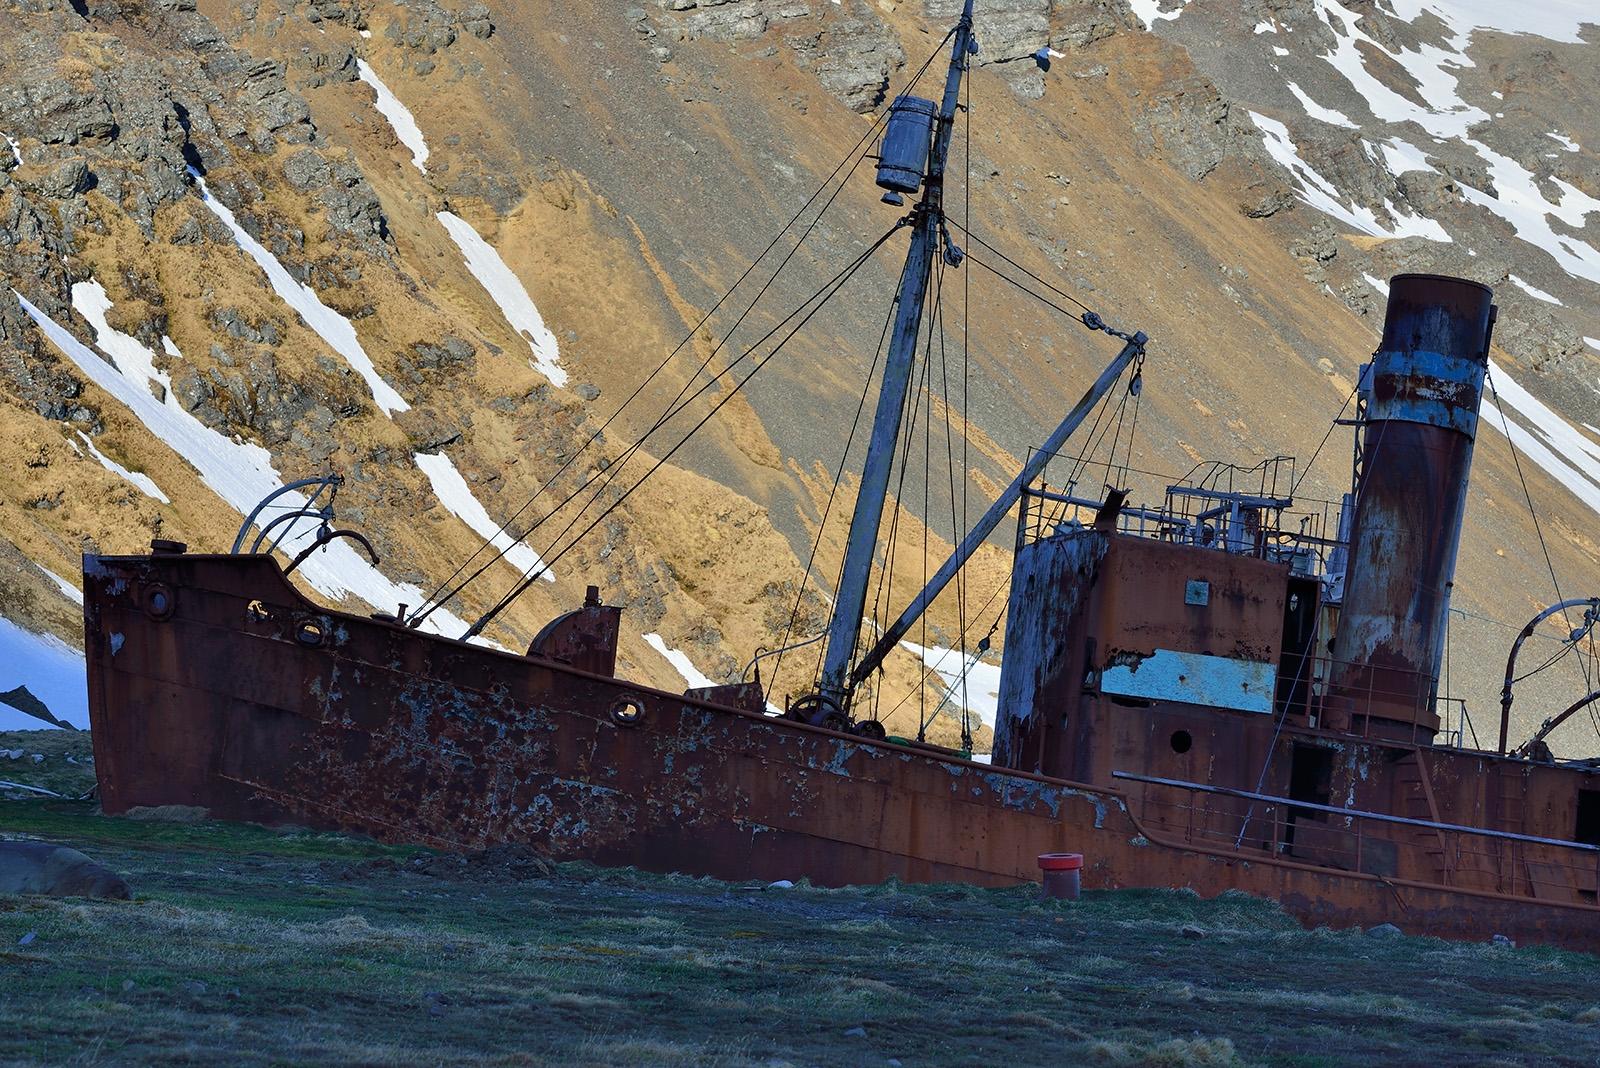 Grytviken_Old whalers boat_South Georgia_November © Martin van Lokven-Oceanwide Expeditions (2).jpg